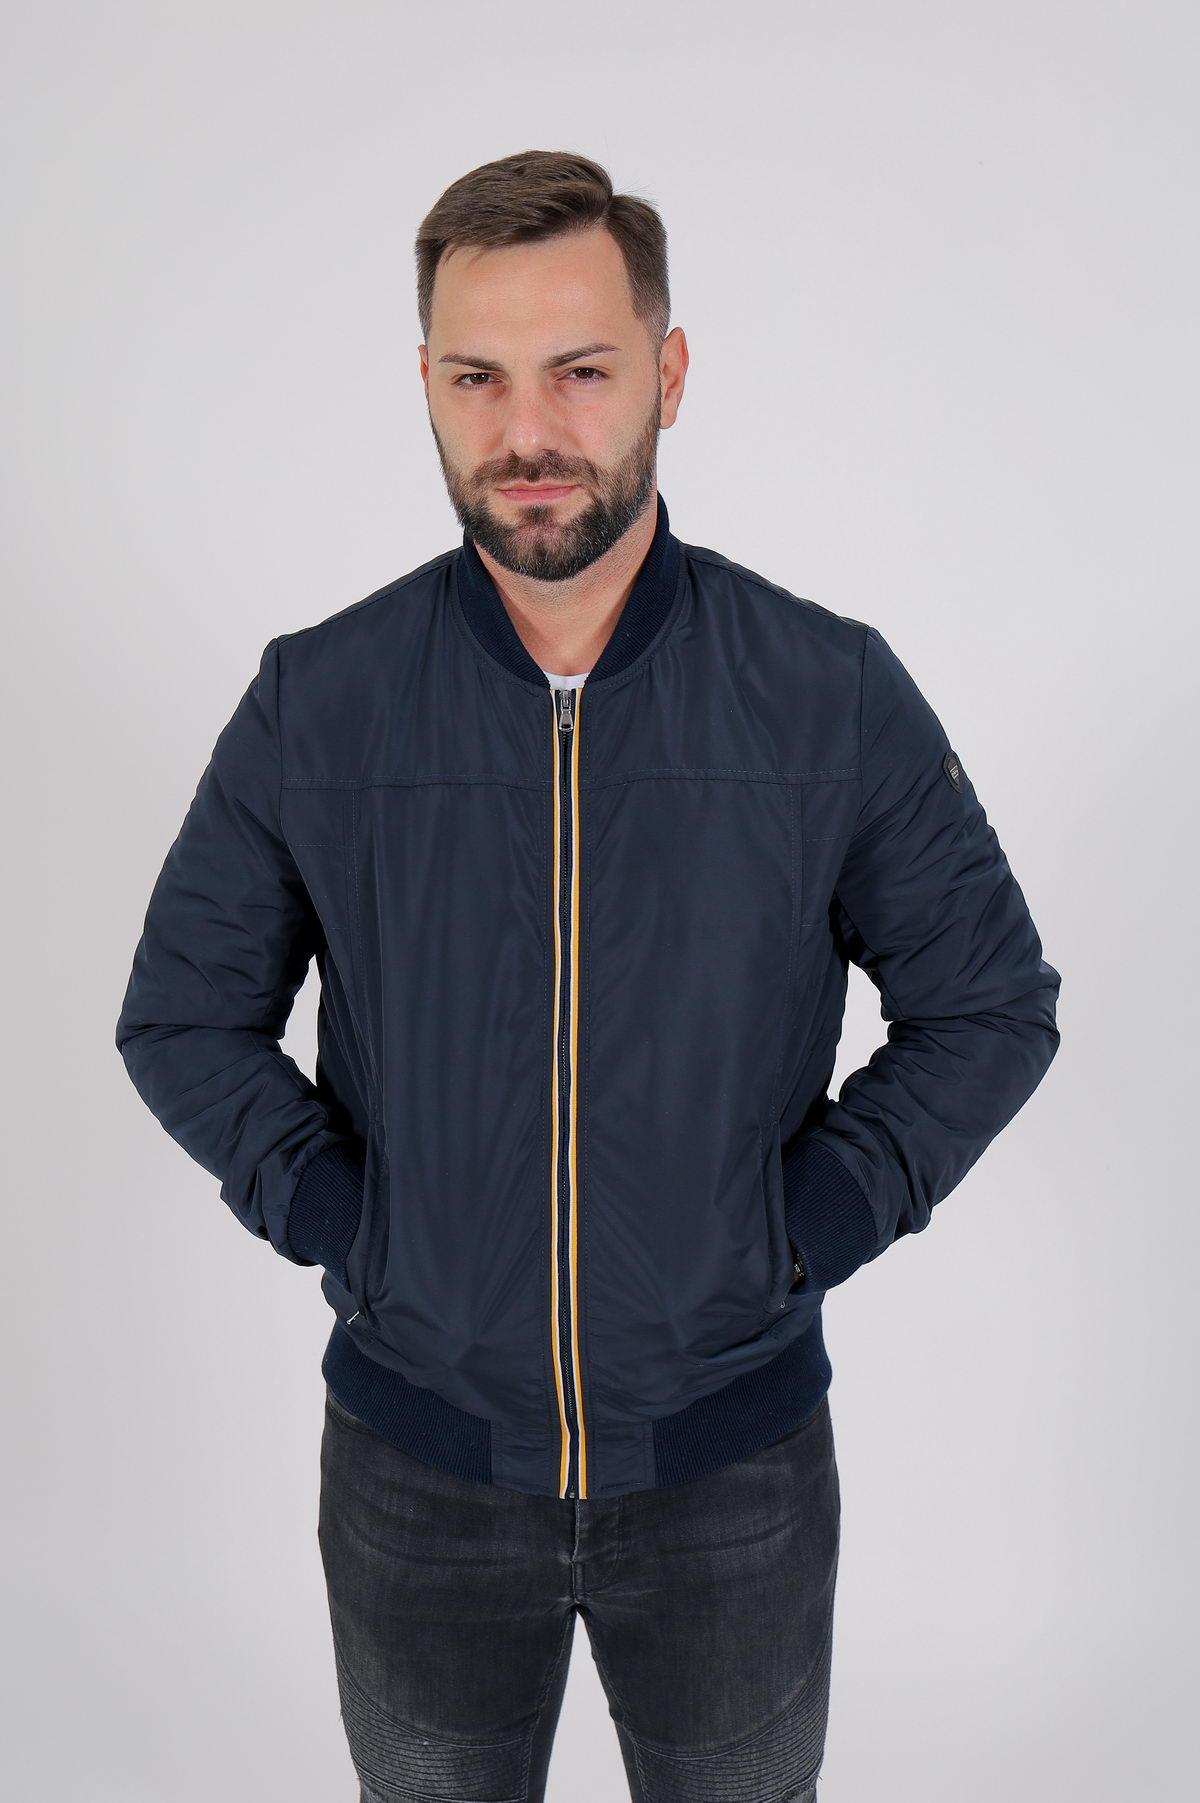 Muška jakna ForteFashion model F